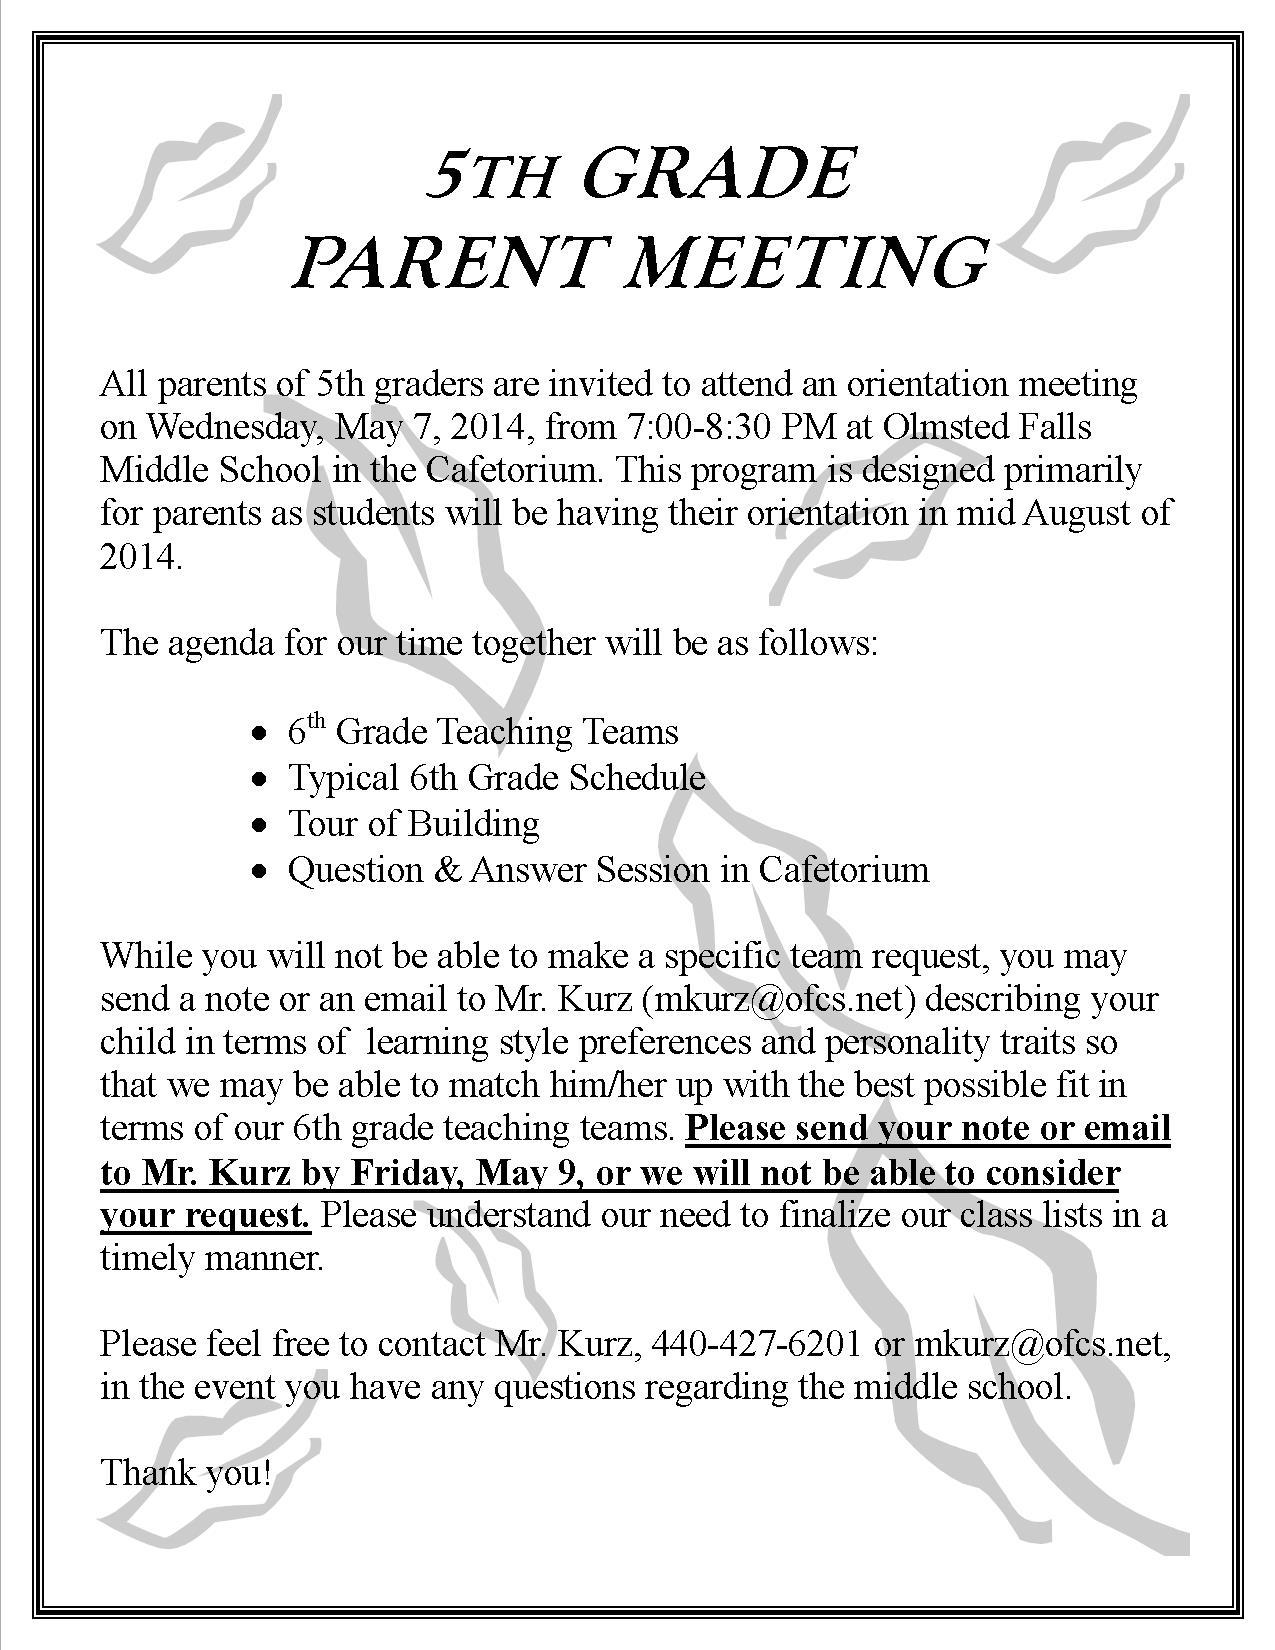 Parent meeting flyer template datariouruguay altavistaventures Images